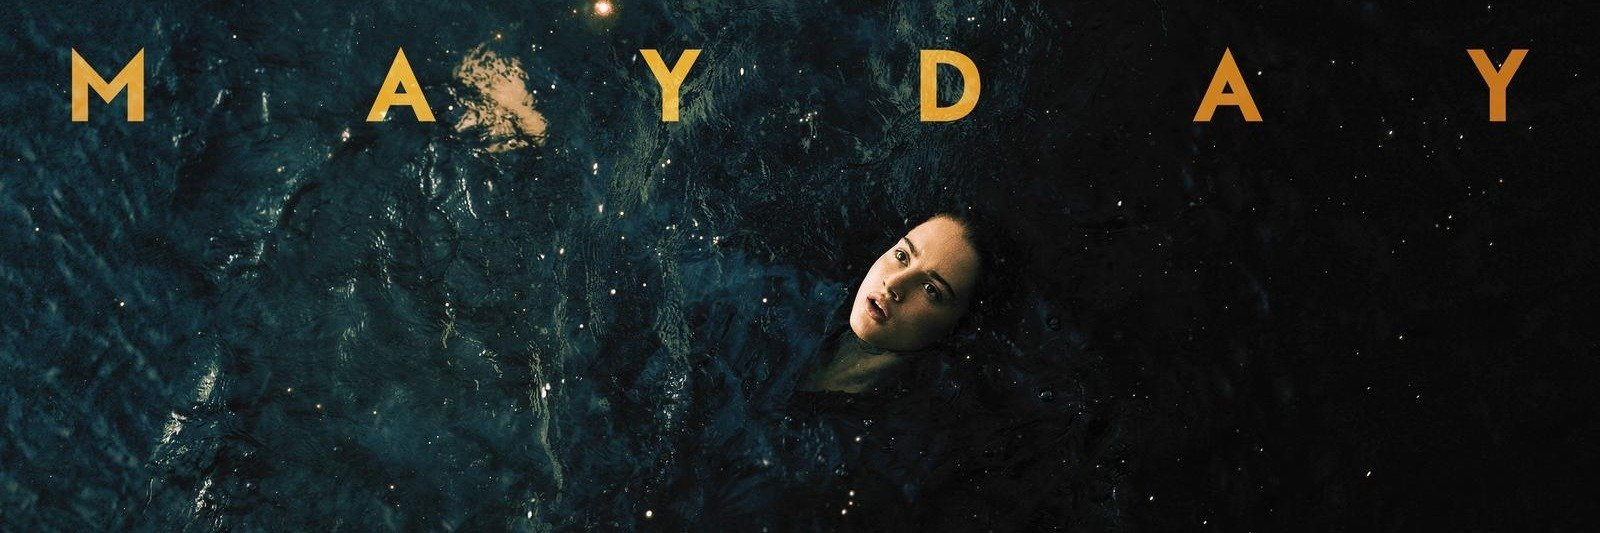 Przedstawiamy: Mayday (Original Motion Picture Soundtrack)